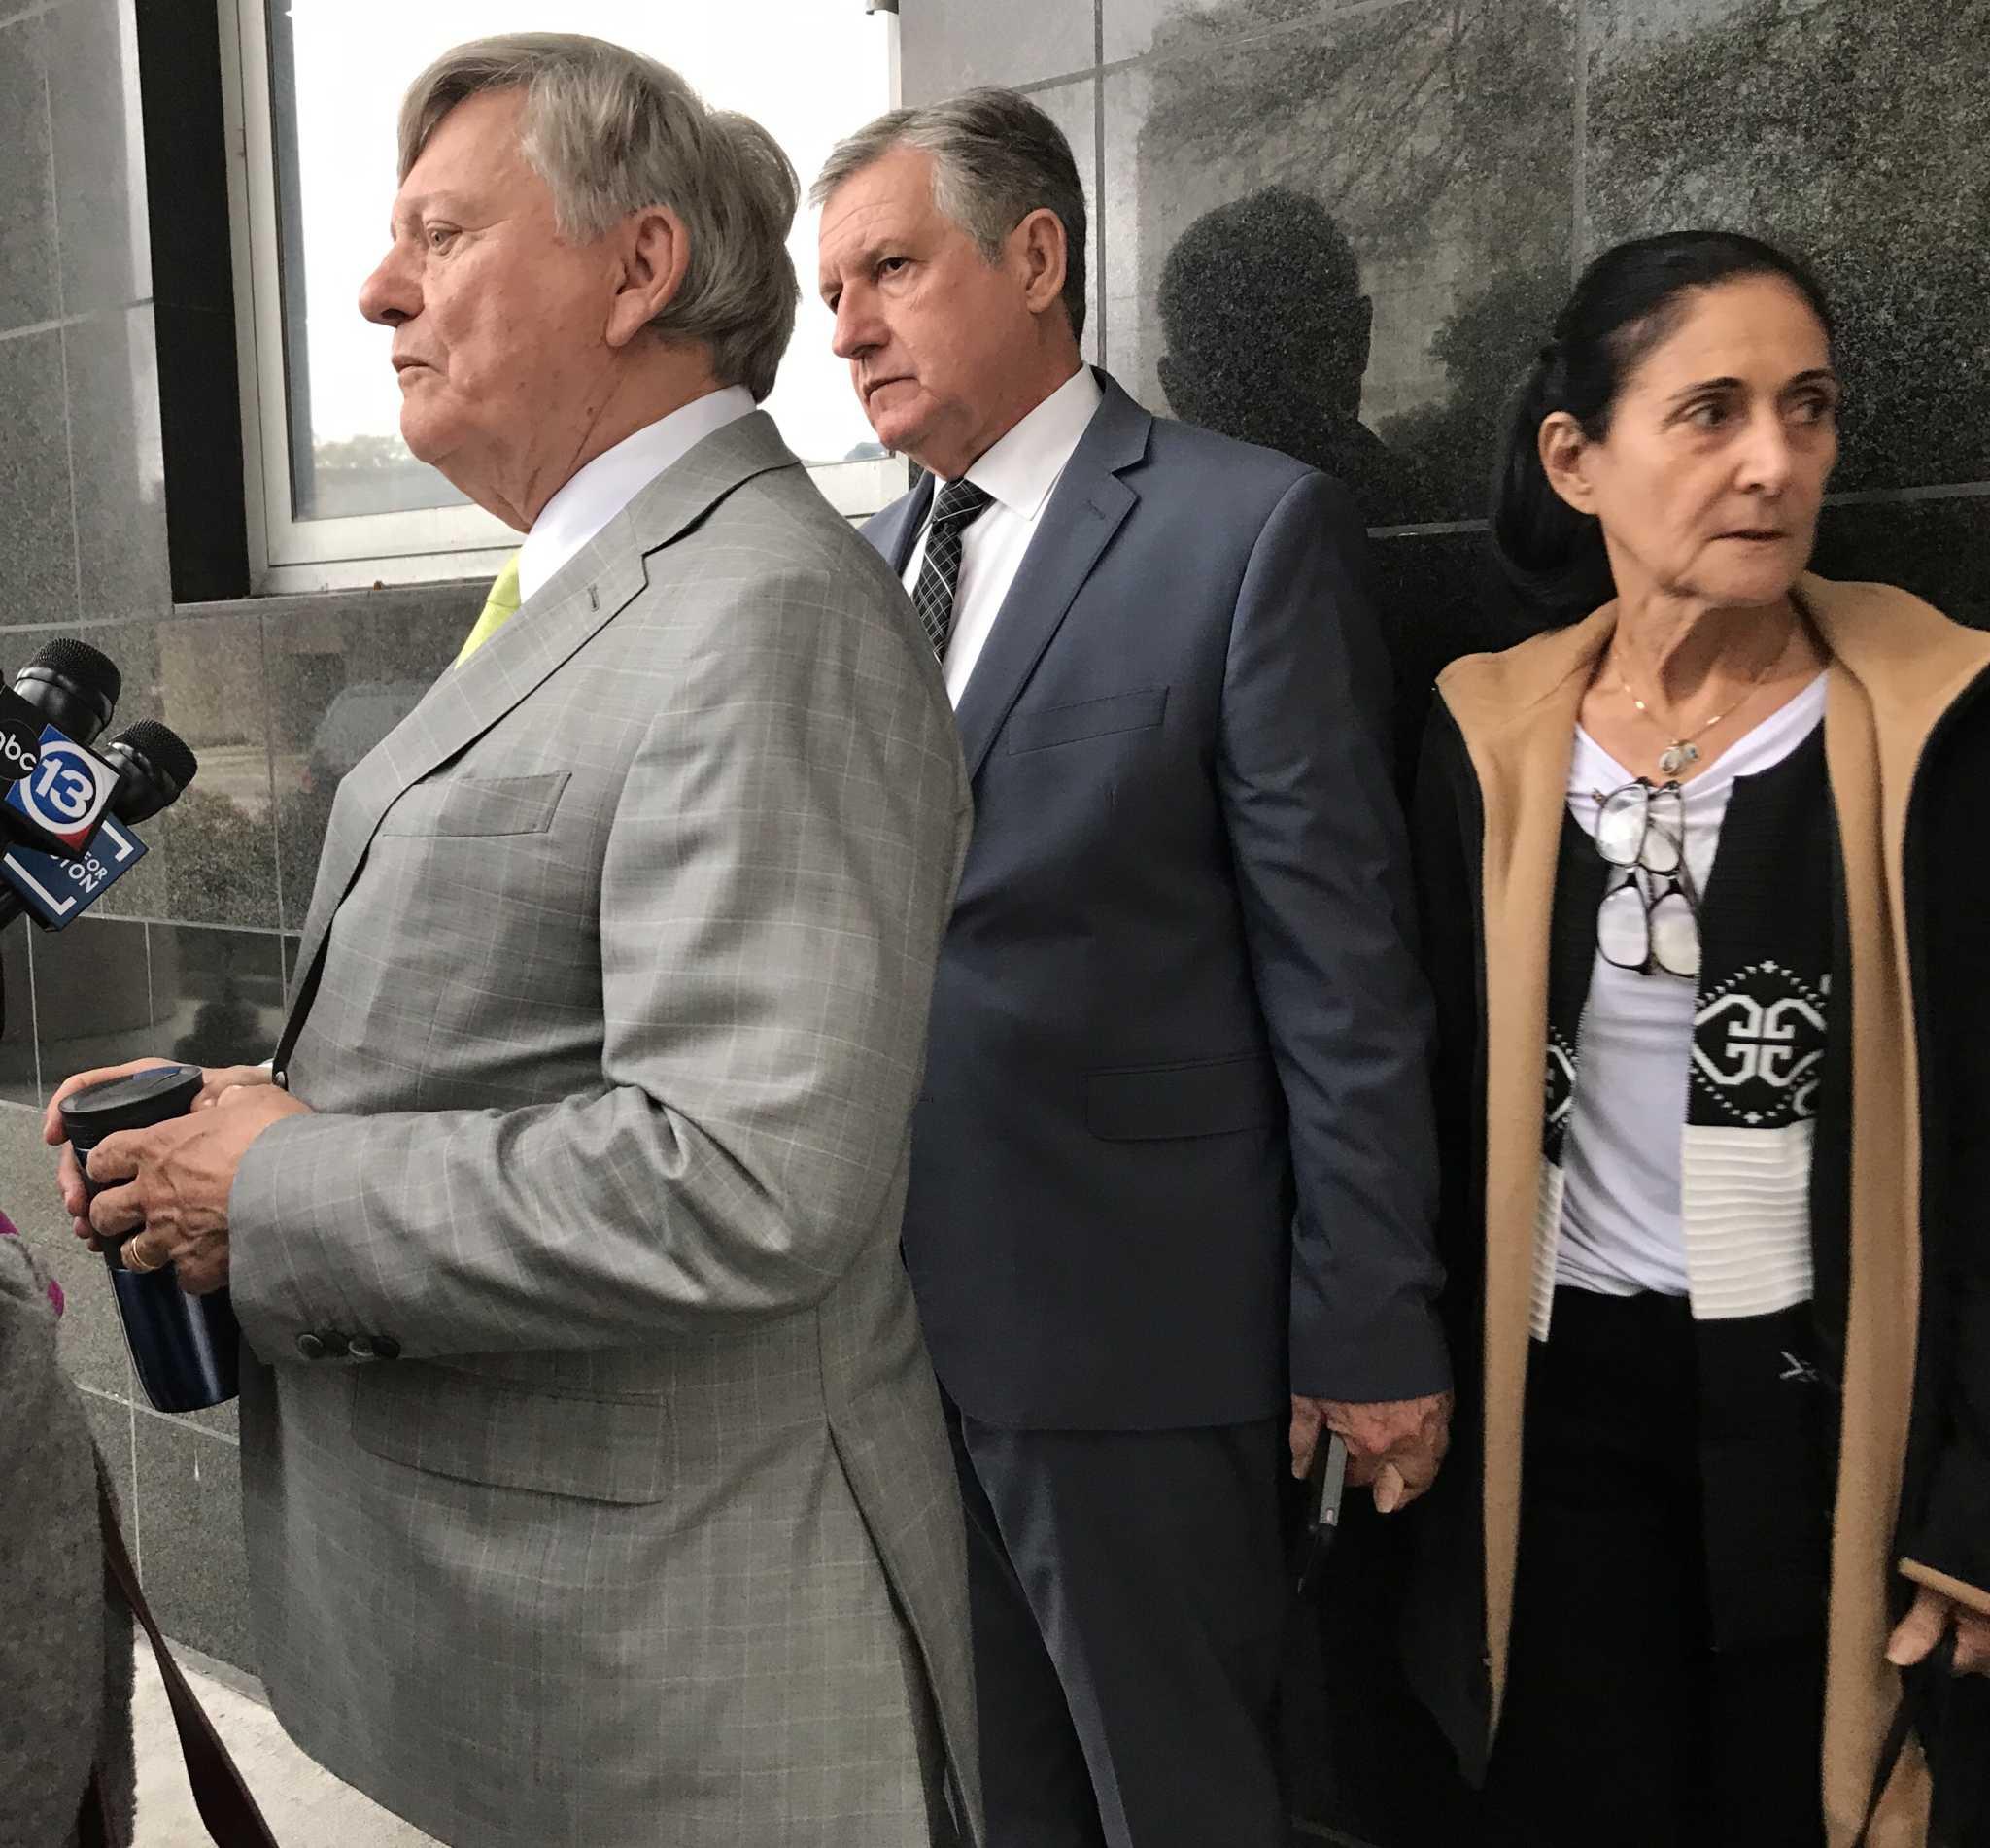 Judge orders light sentences for Brazilian grandparents in